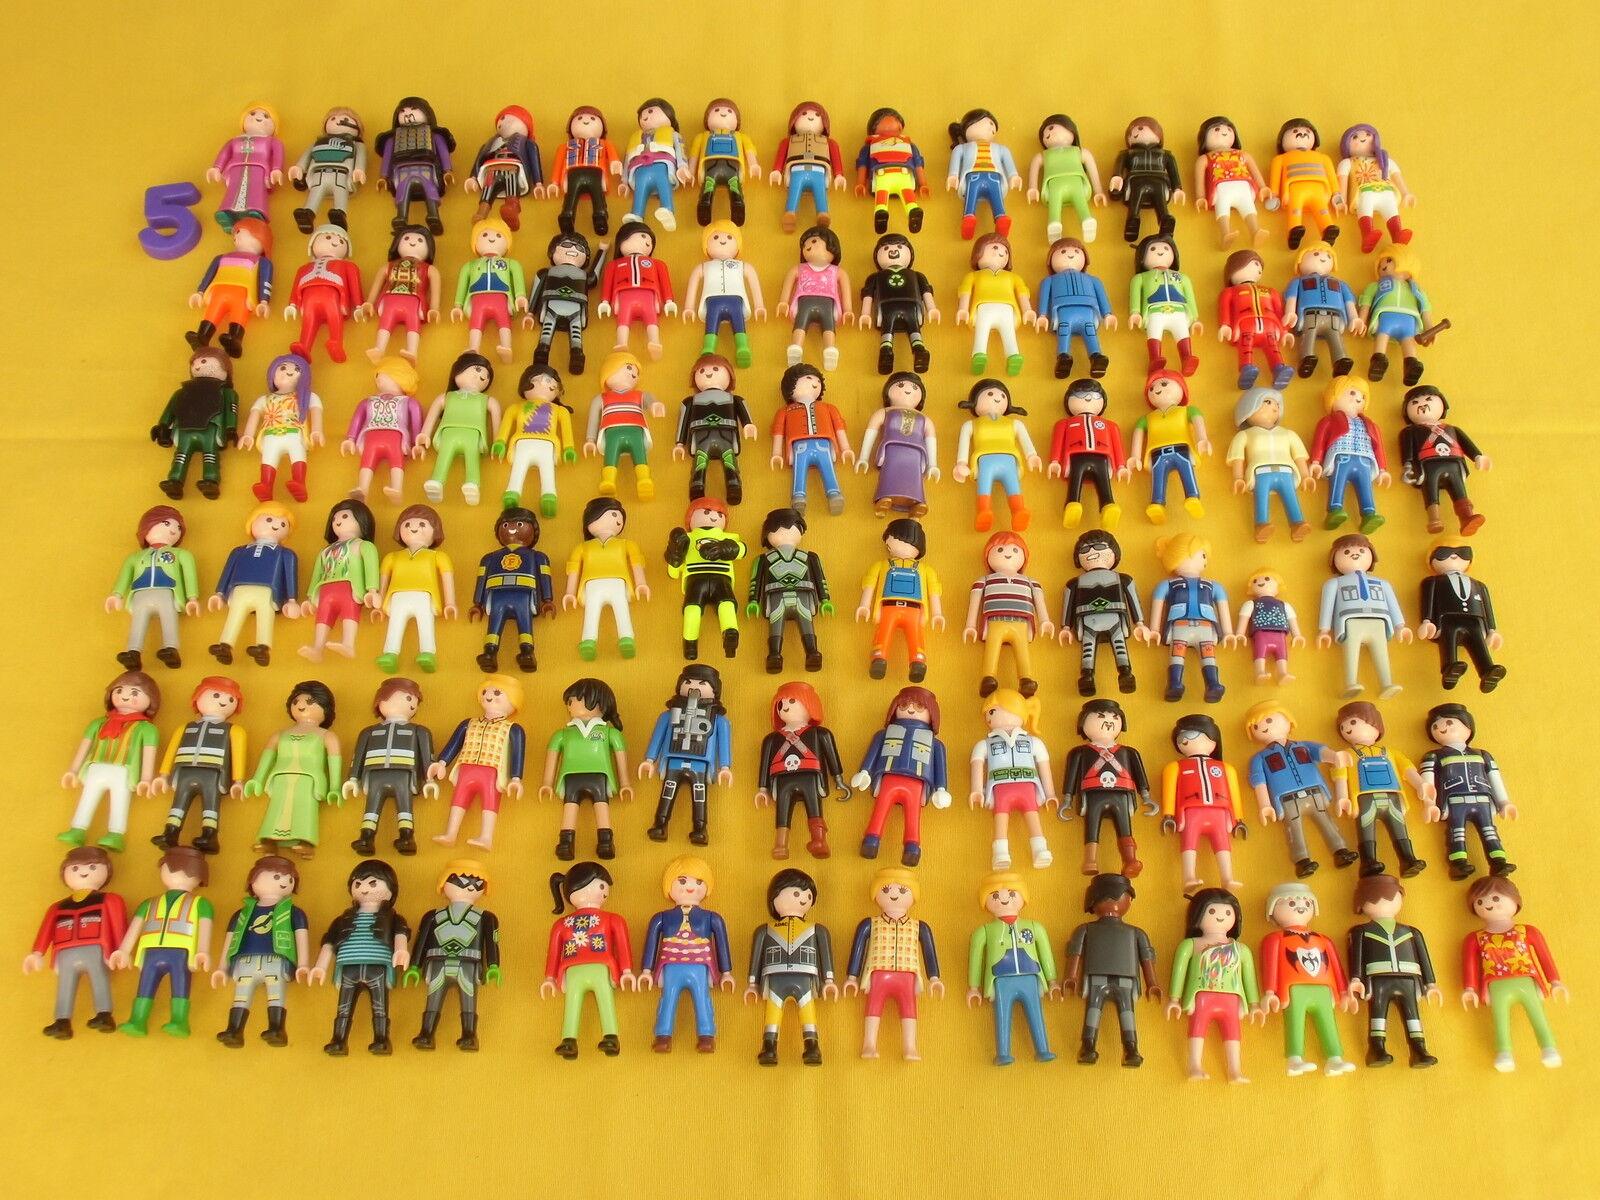 Playmobil FIGURAS, 90 FIGURAS VARIADAS, NOVEDAD, SIN USAR, LOTE 5